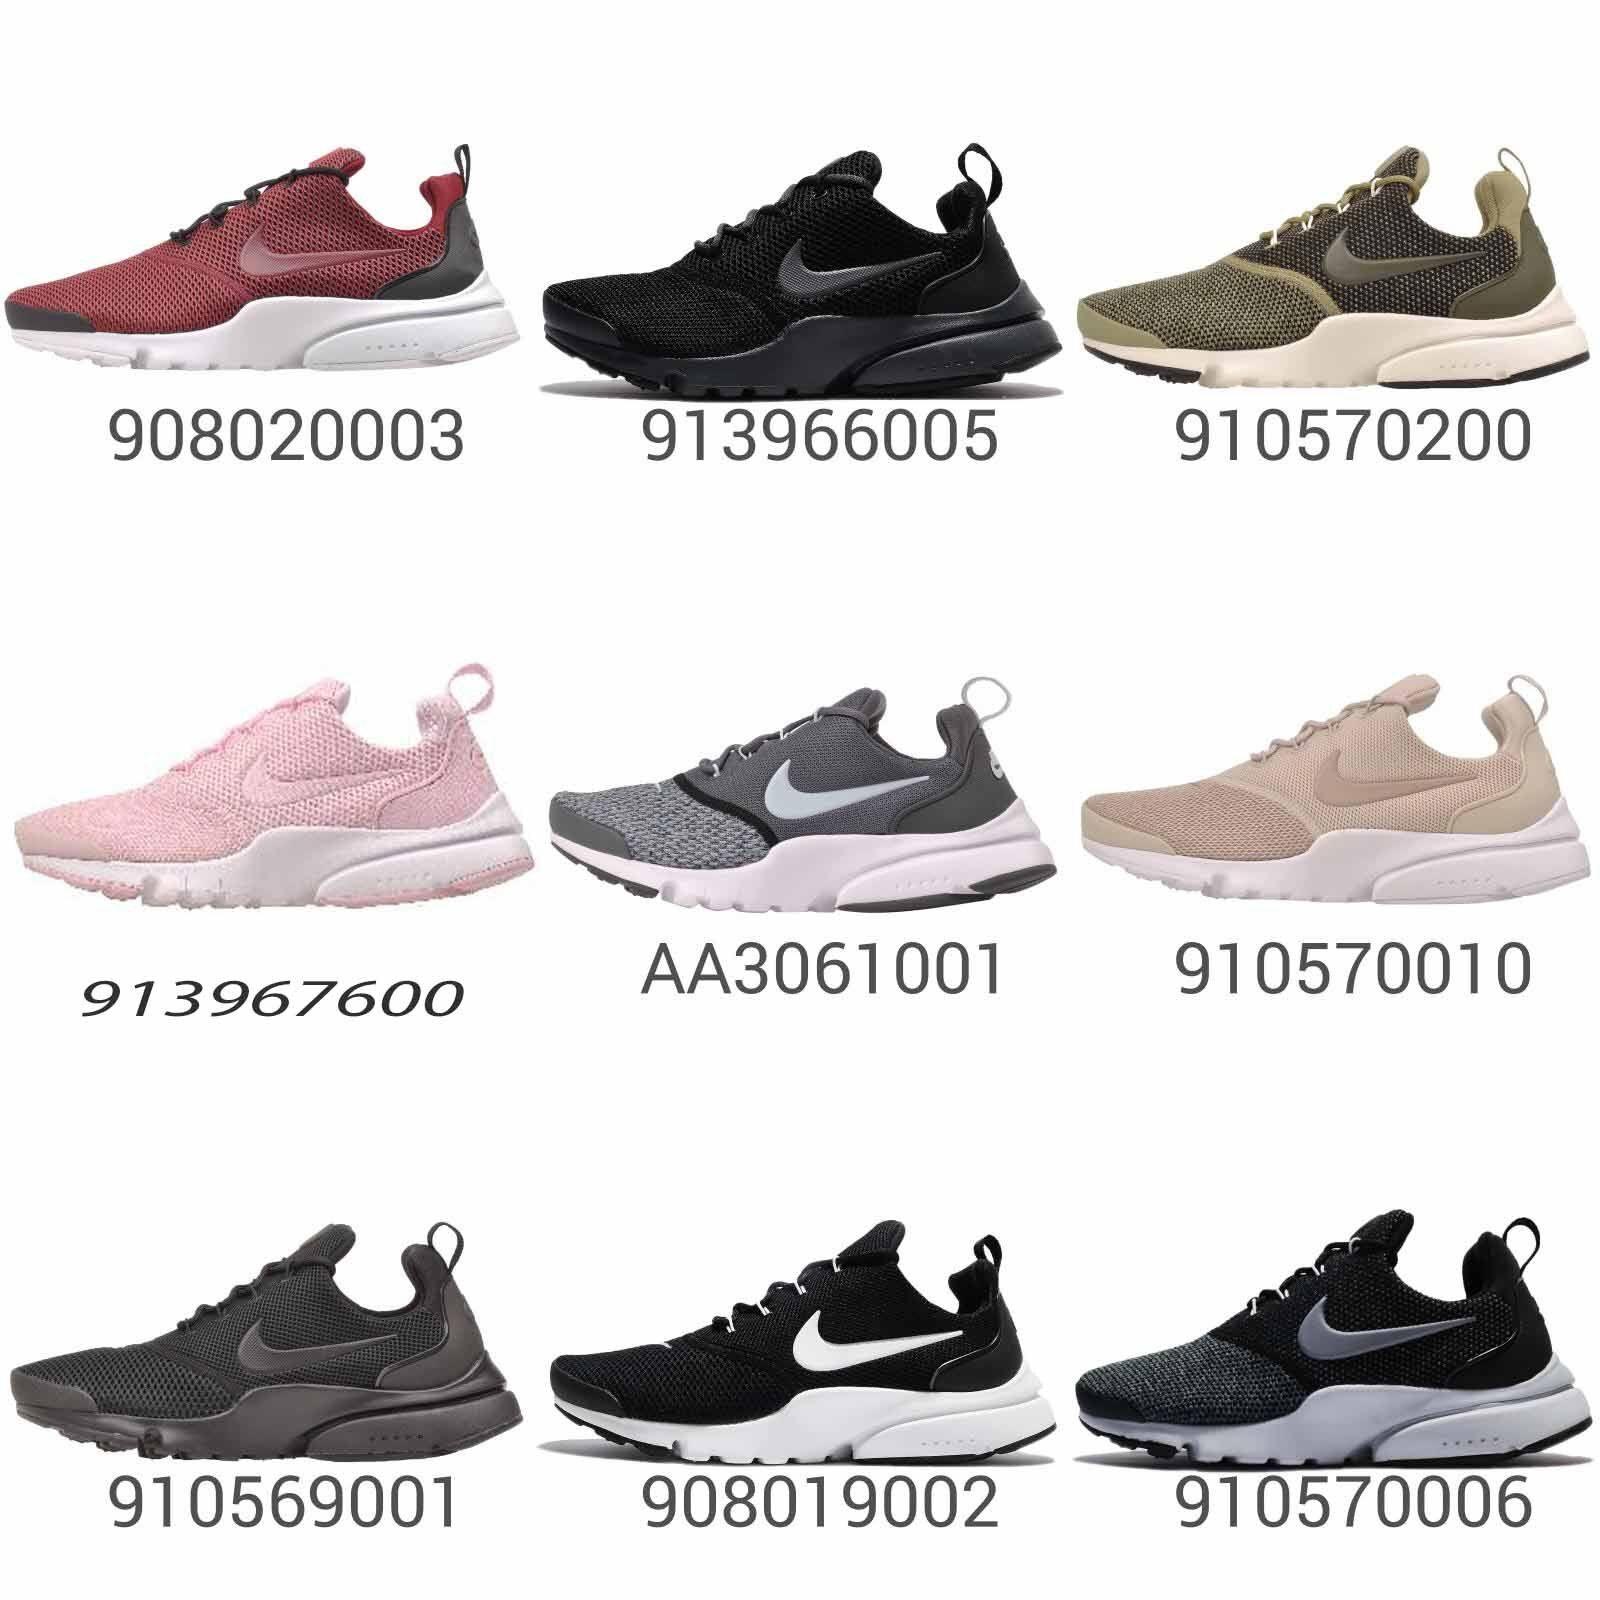 Nike Presto Fly SE 1 Uomo Donna Kids GS Running Shoes Pick 1 SE ff7c76